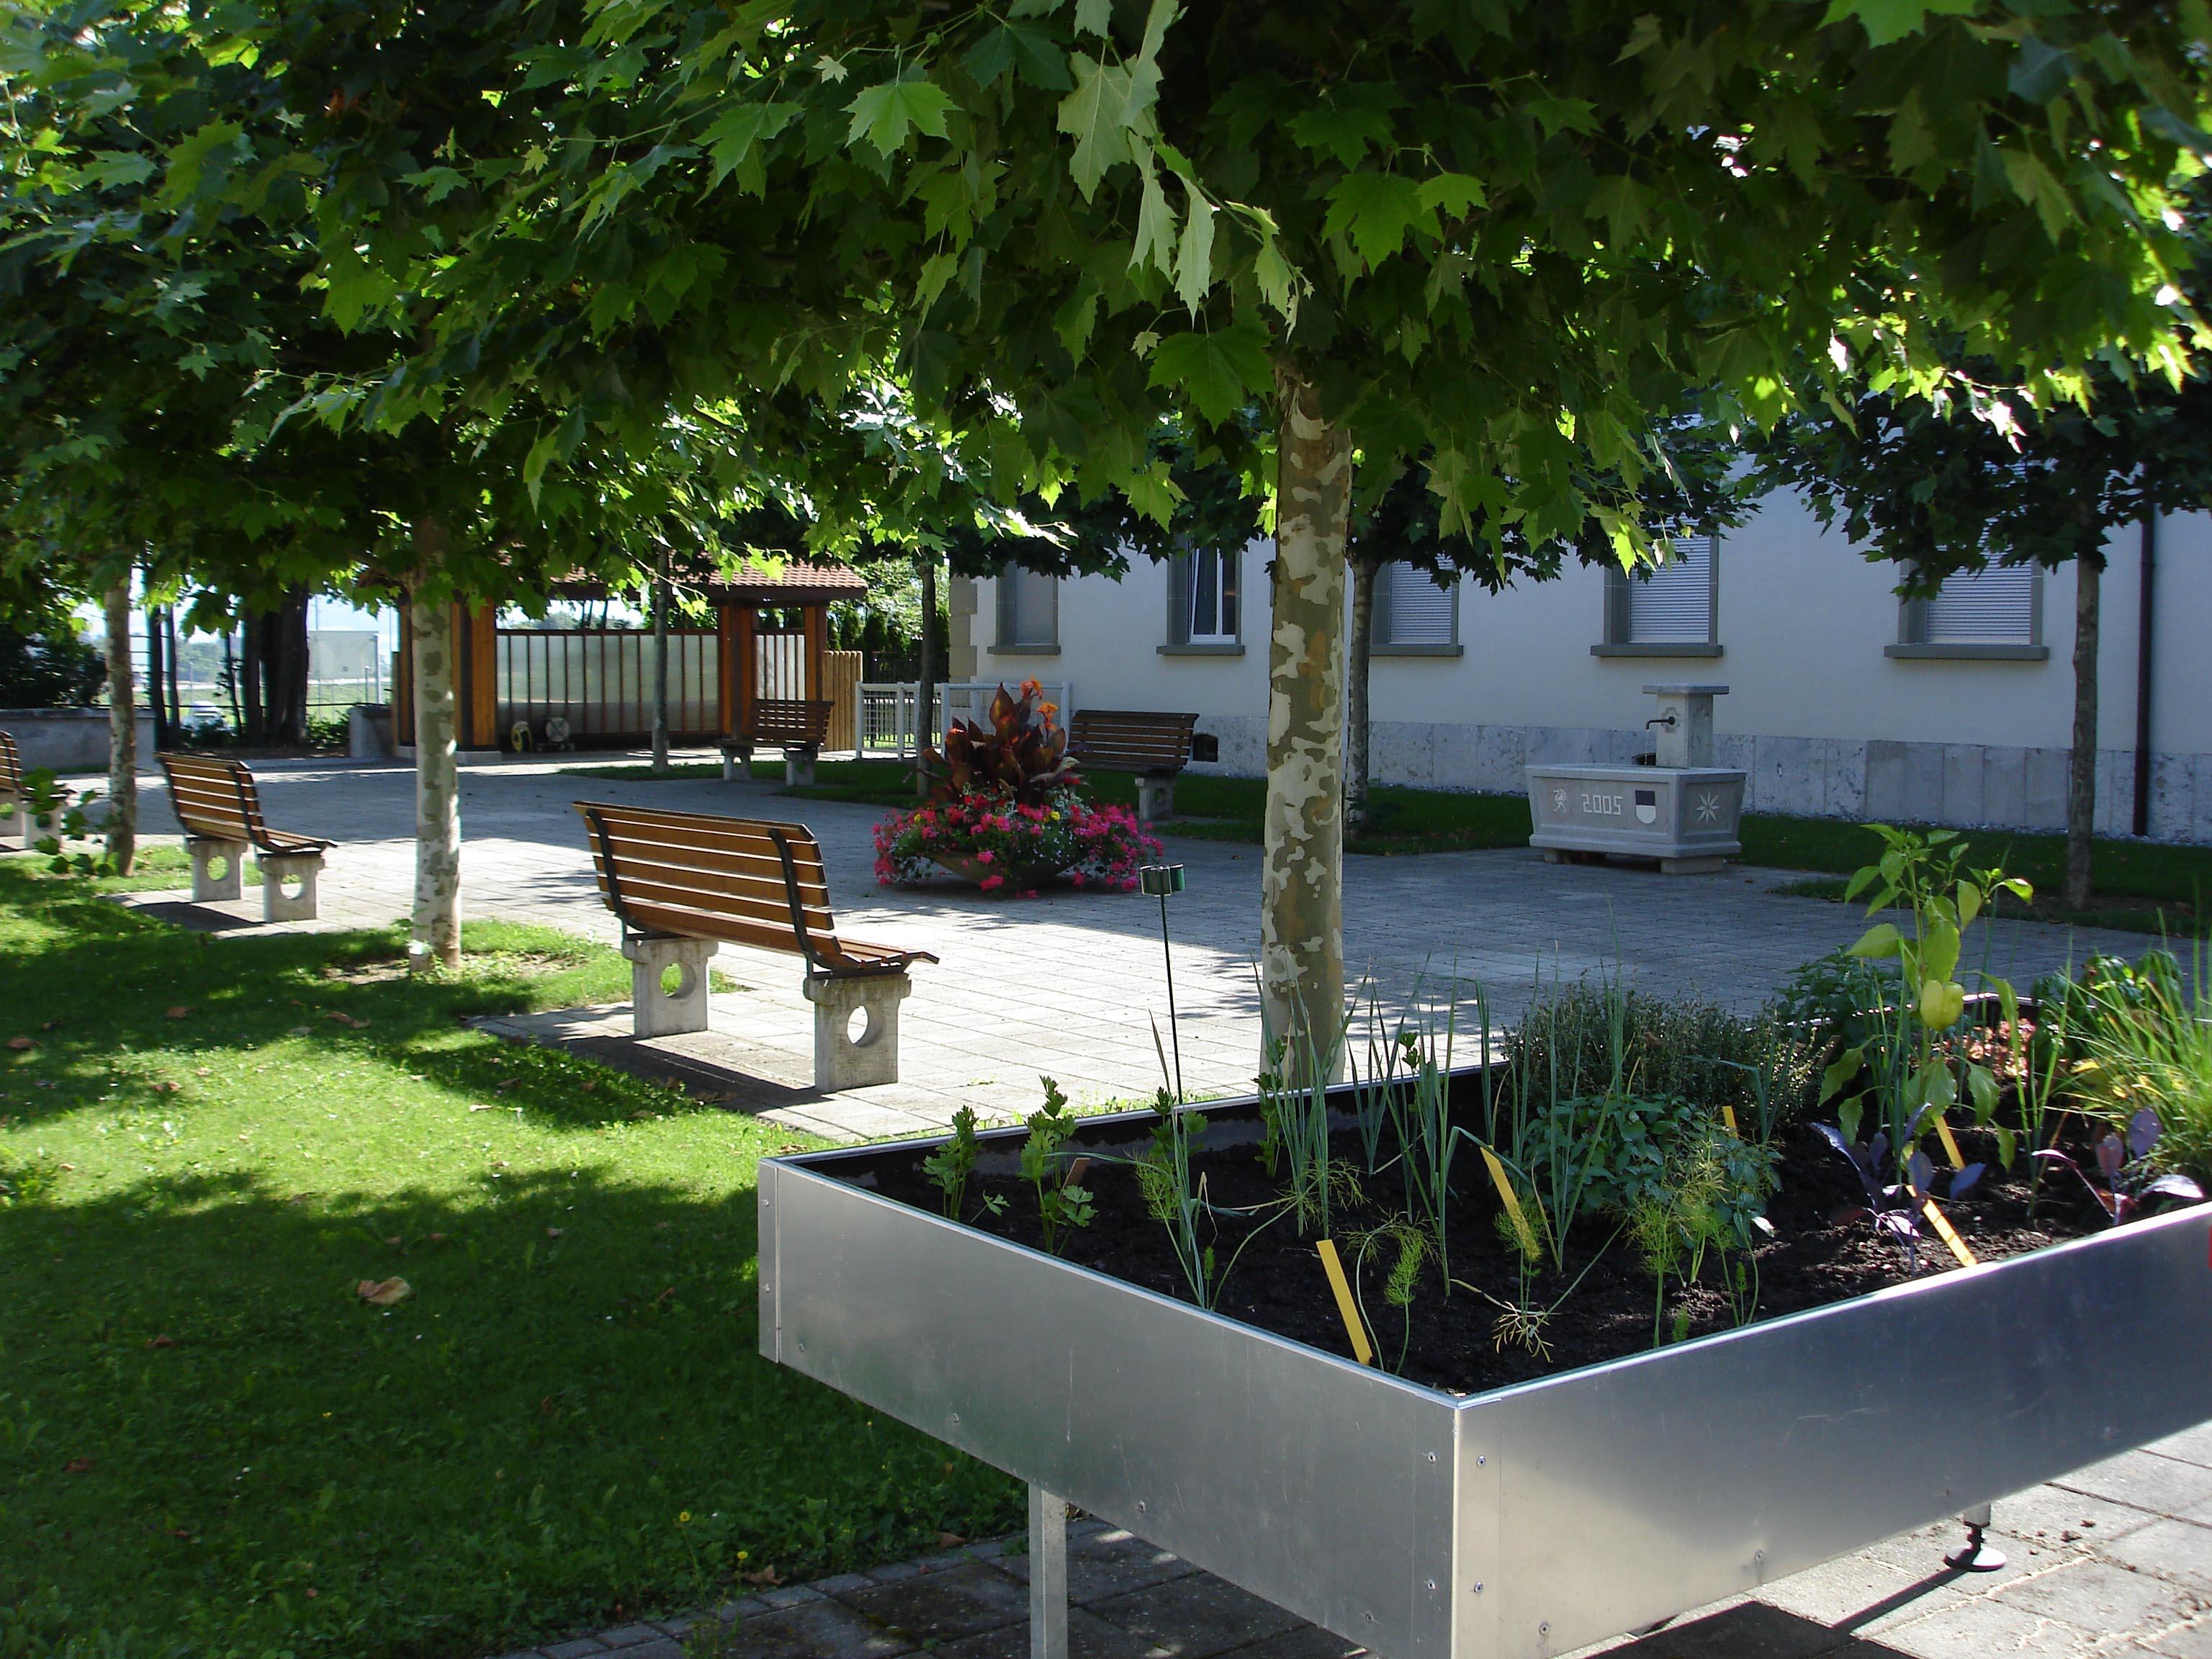 Jardins du centre hospitalier de Marsens